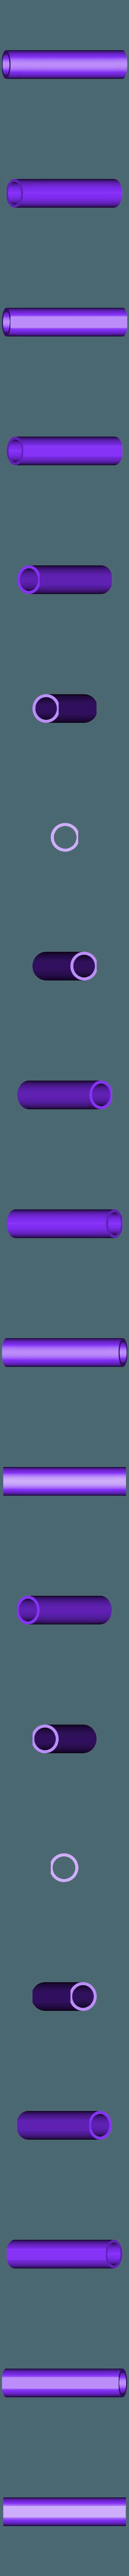 Barrell_BL.stl Télécharger fichier STL gratuit Borderlands Bandit Room Clener Shotgun • Modèle pour impression 3D, Dsk